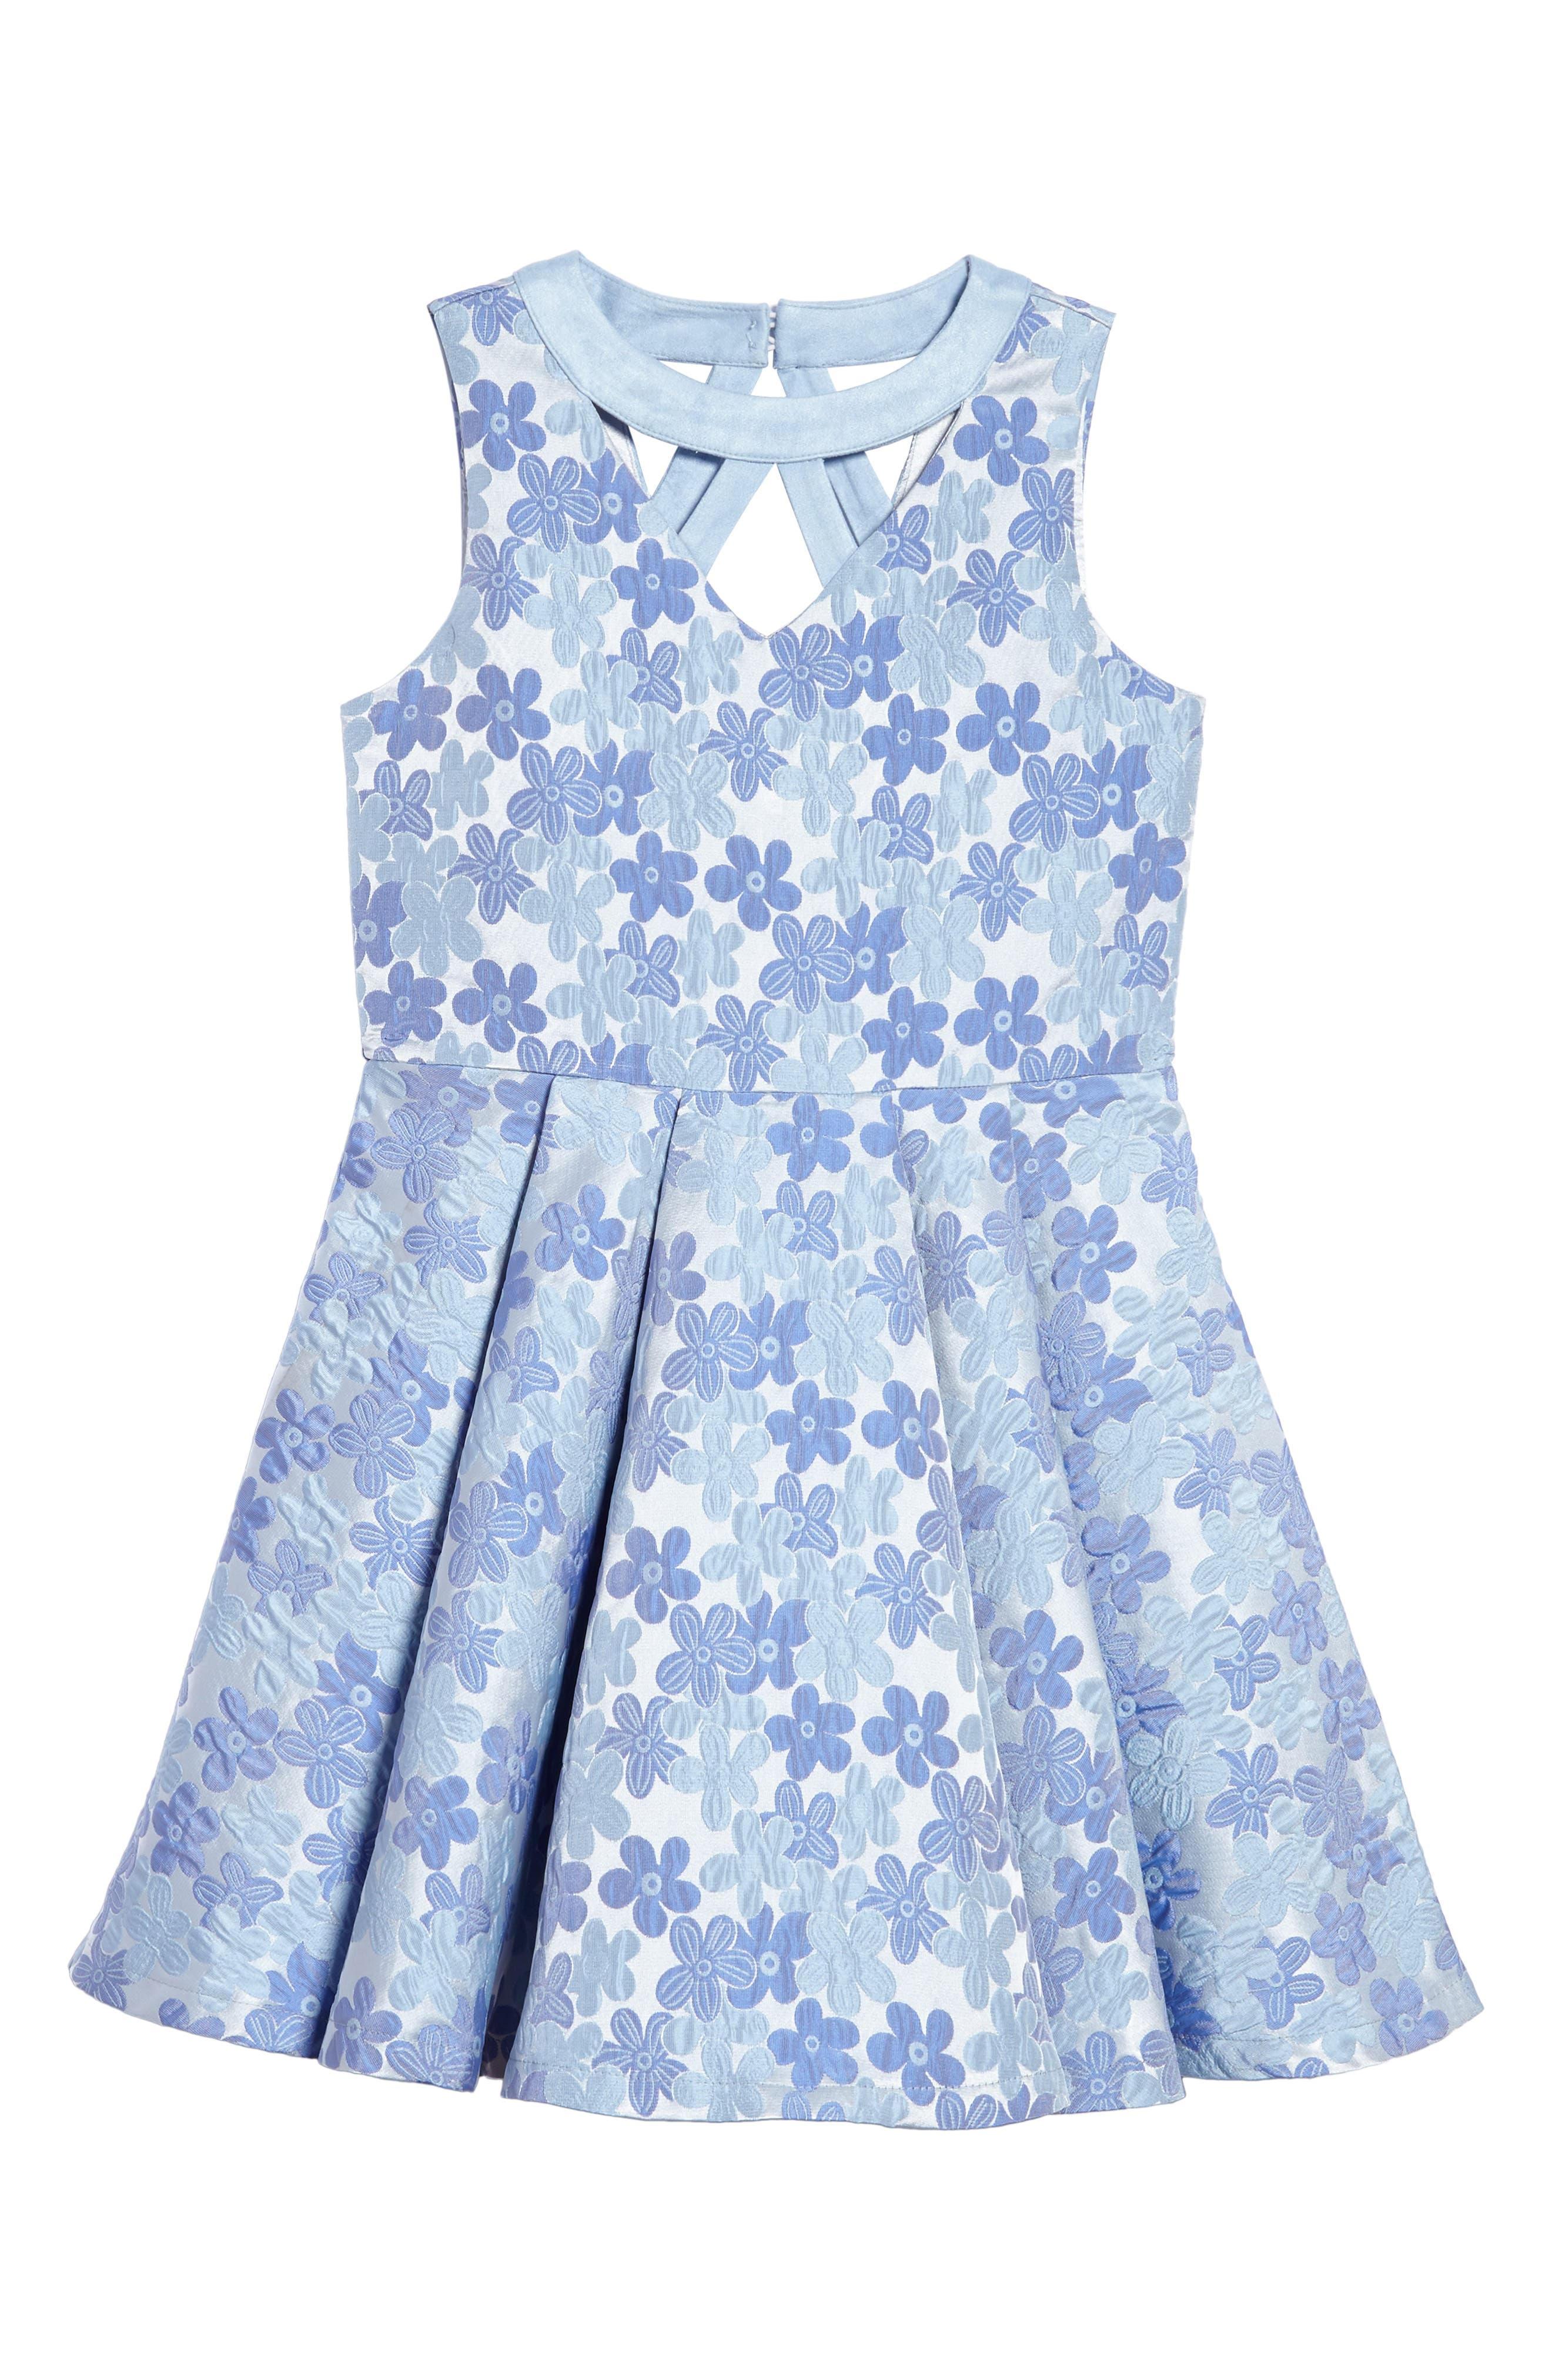 Daisy Brocade Fit & Flare Dress,                             Main thumbnail 1, color,